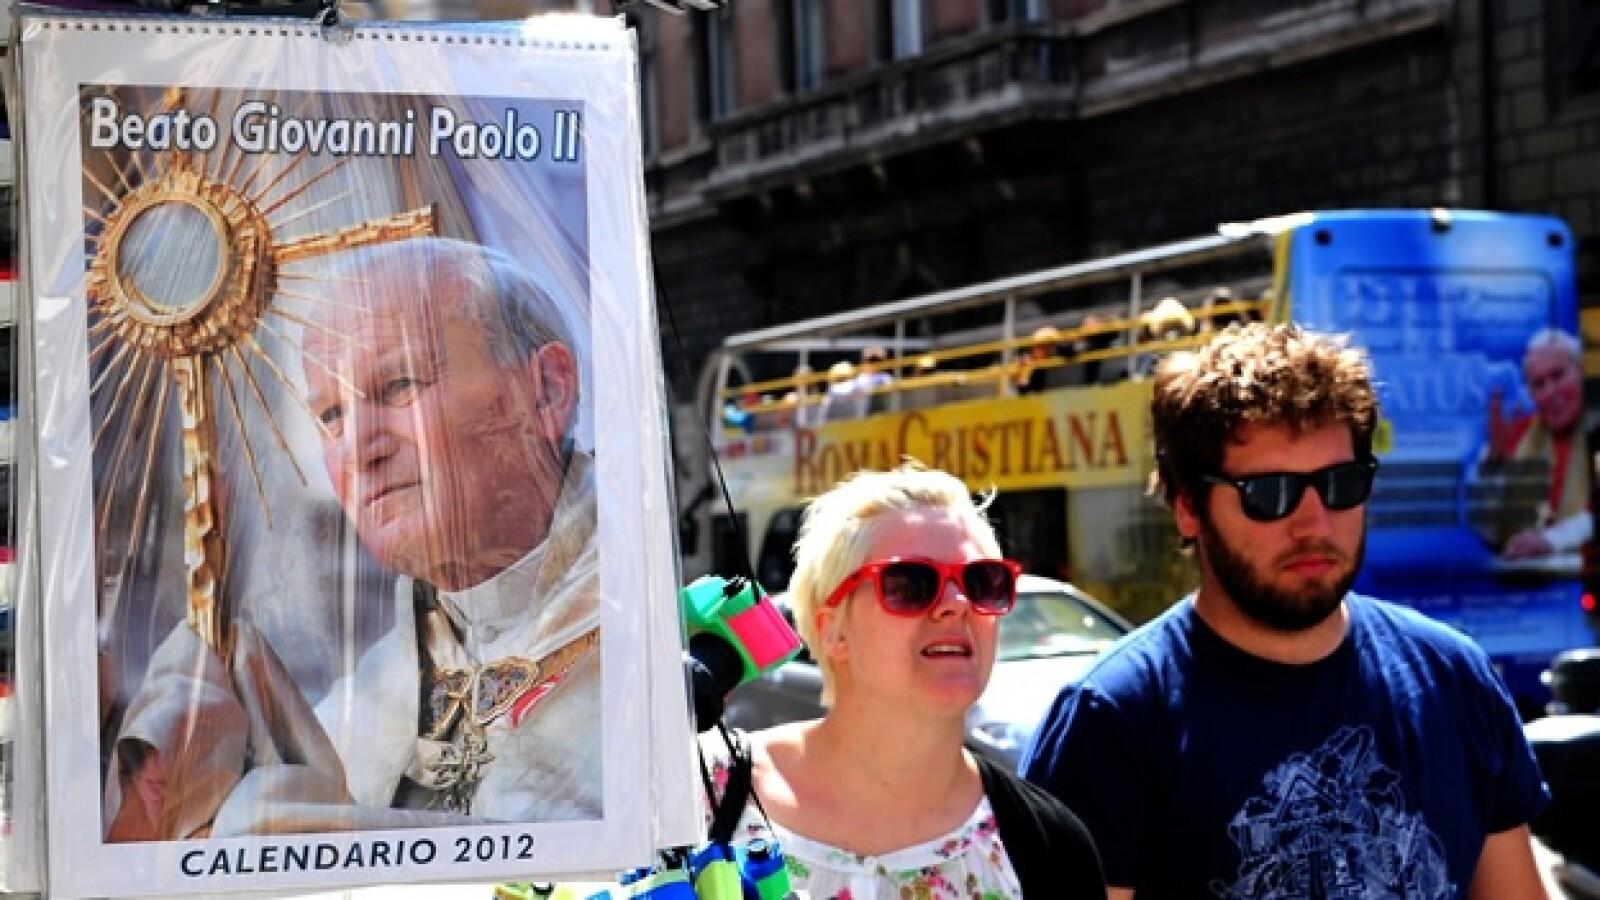 Juan Pablo II - poster santísimo